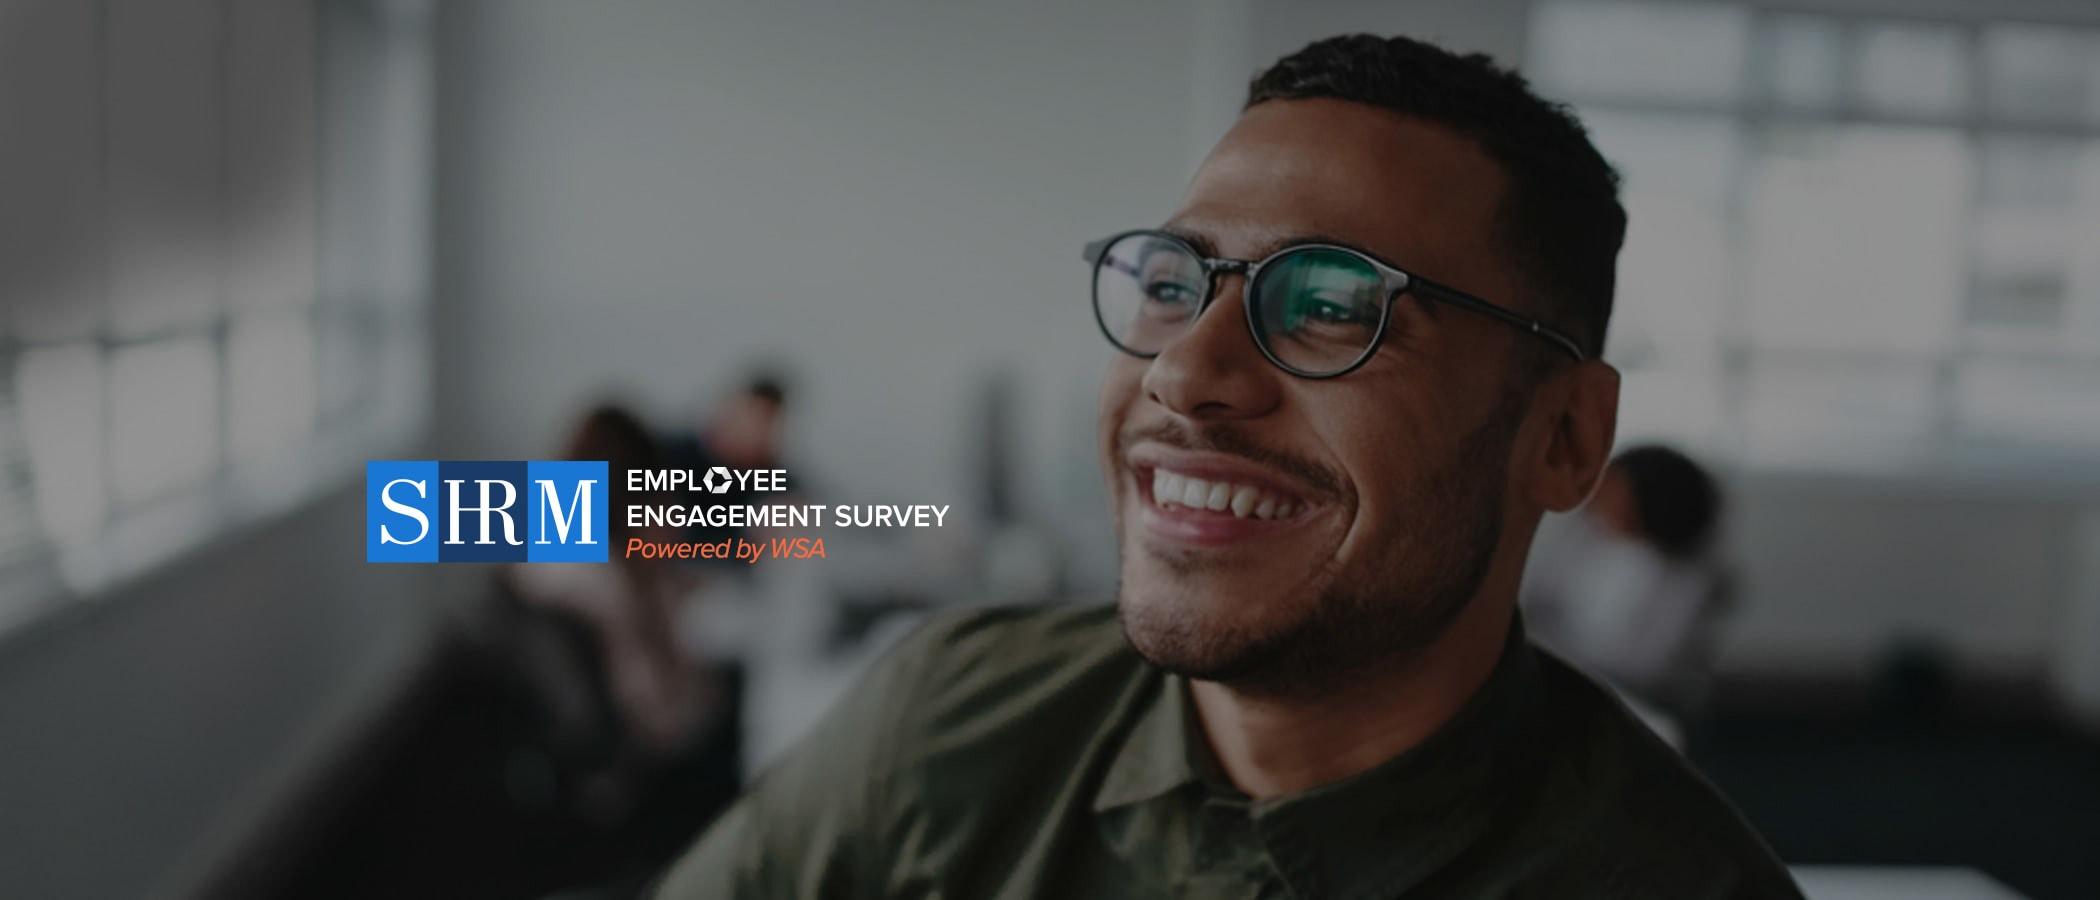 SHRM Employee Engagement Survey